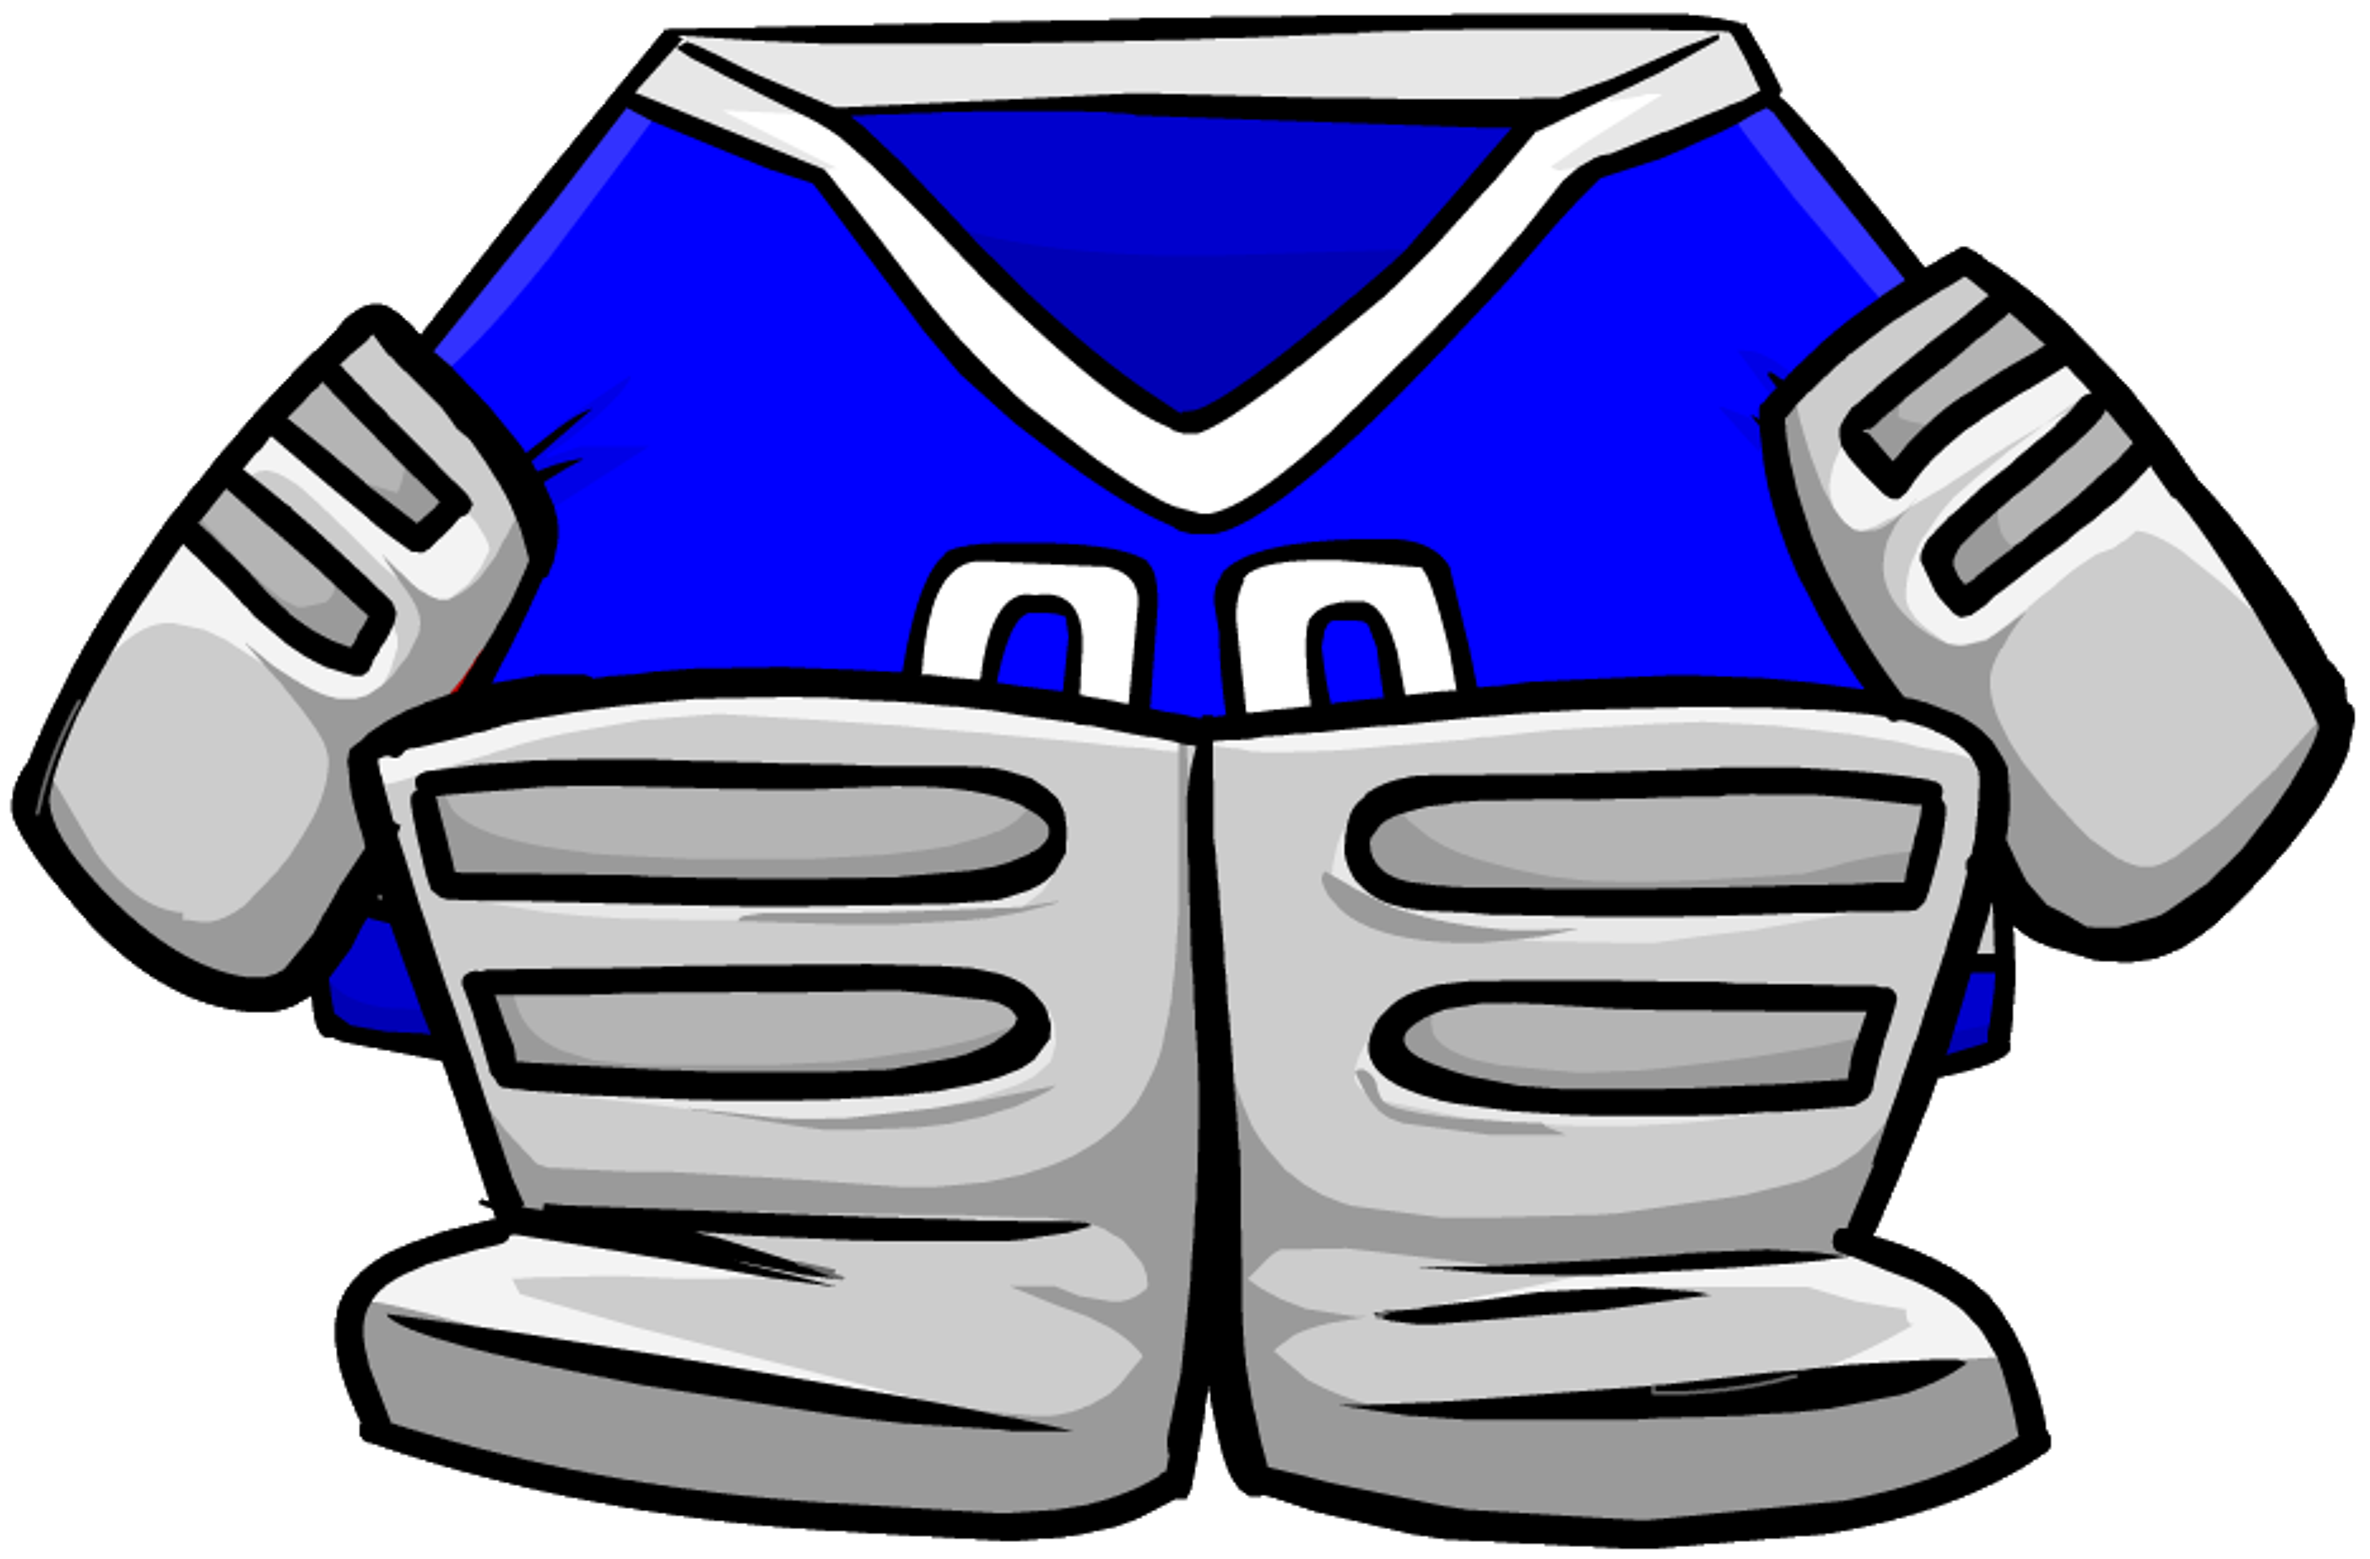 Blue Goalie Gear